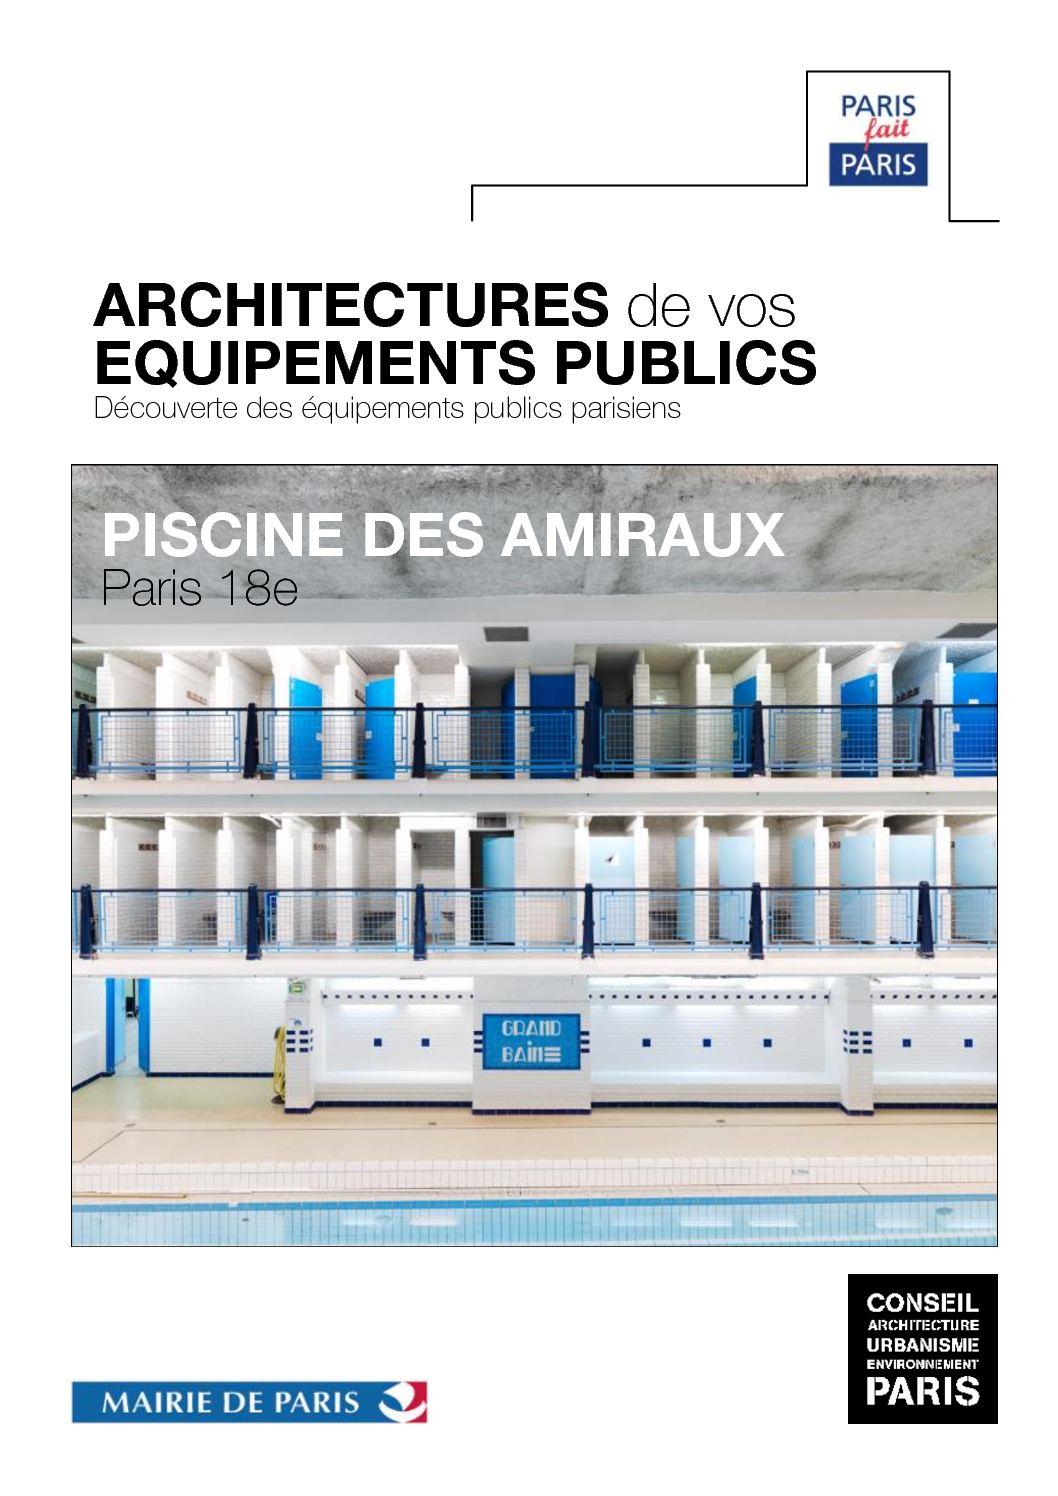 Calam o livret equipement public piscine des amiraux for Piscine des amiraux